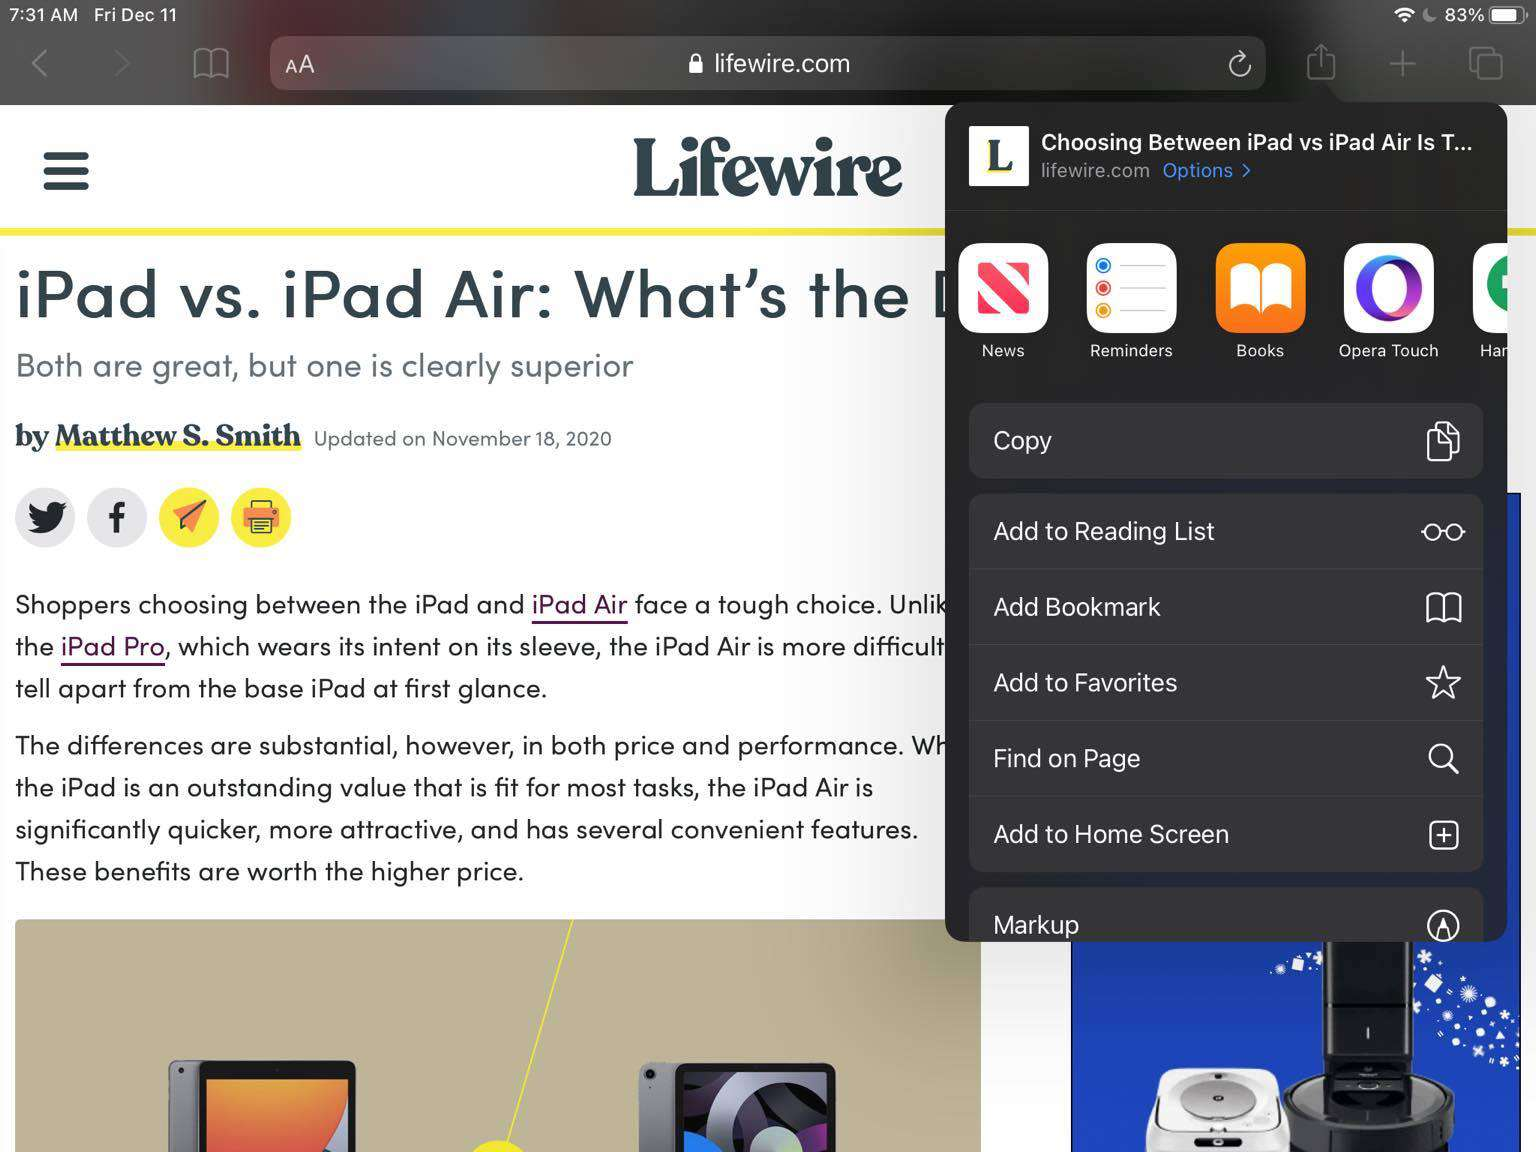 Screenshot of the send to Books option on an iPad